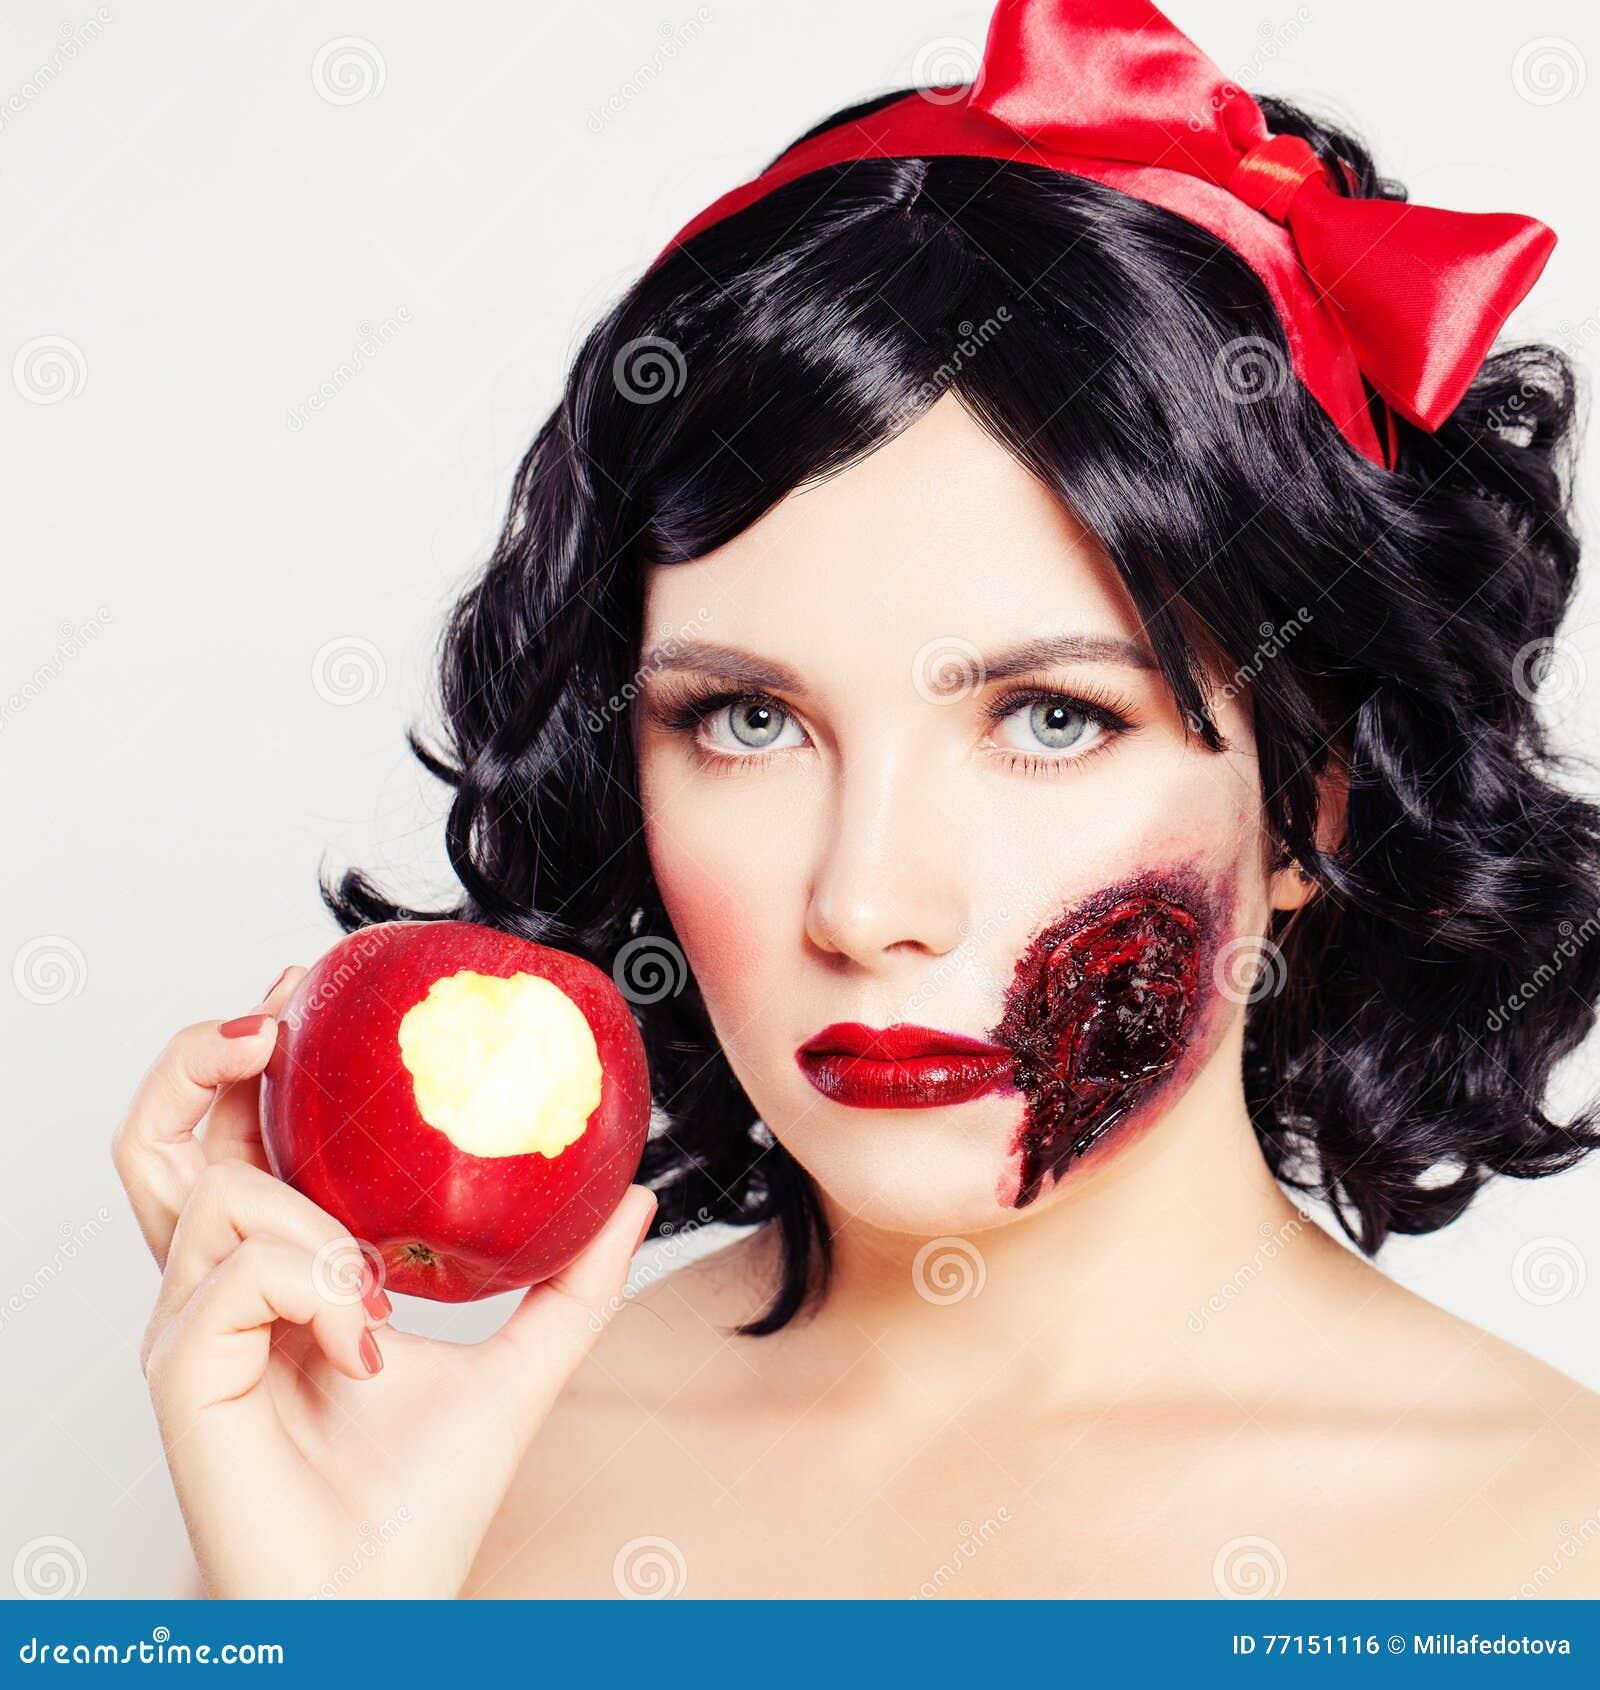 Maquillage artistique de Halloween Haracters blancs de ¡ de la neige Ð de femme